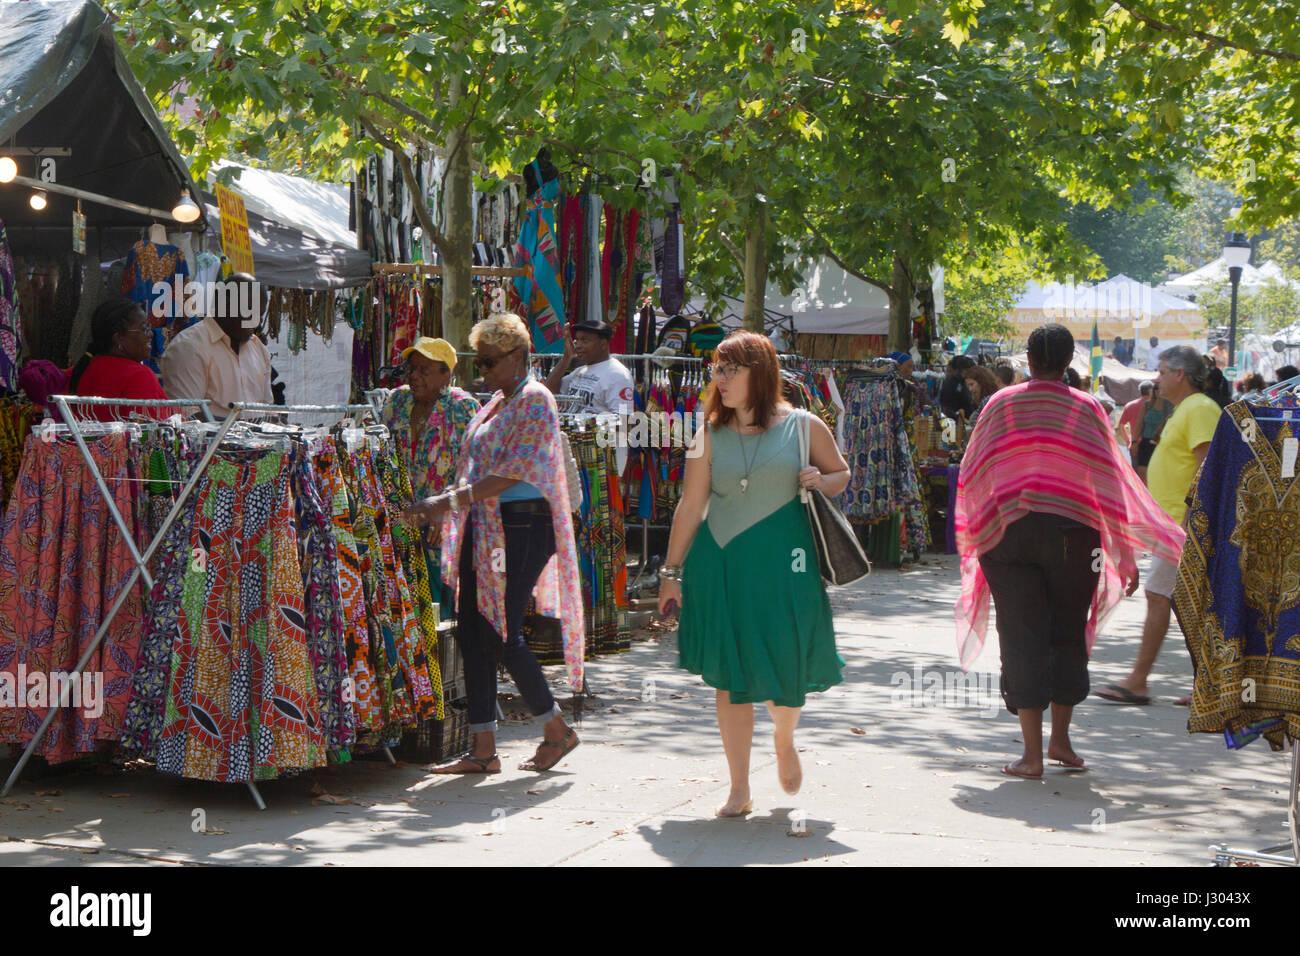 Asheville, North Carolina, USA - September 9, 2016: The 2016 Goombay Festival, a three day festival that celebrates - Stock Image